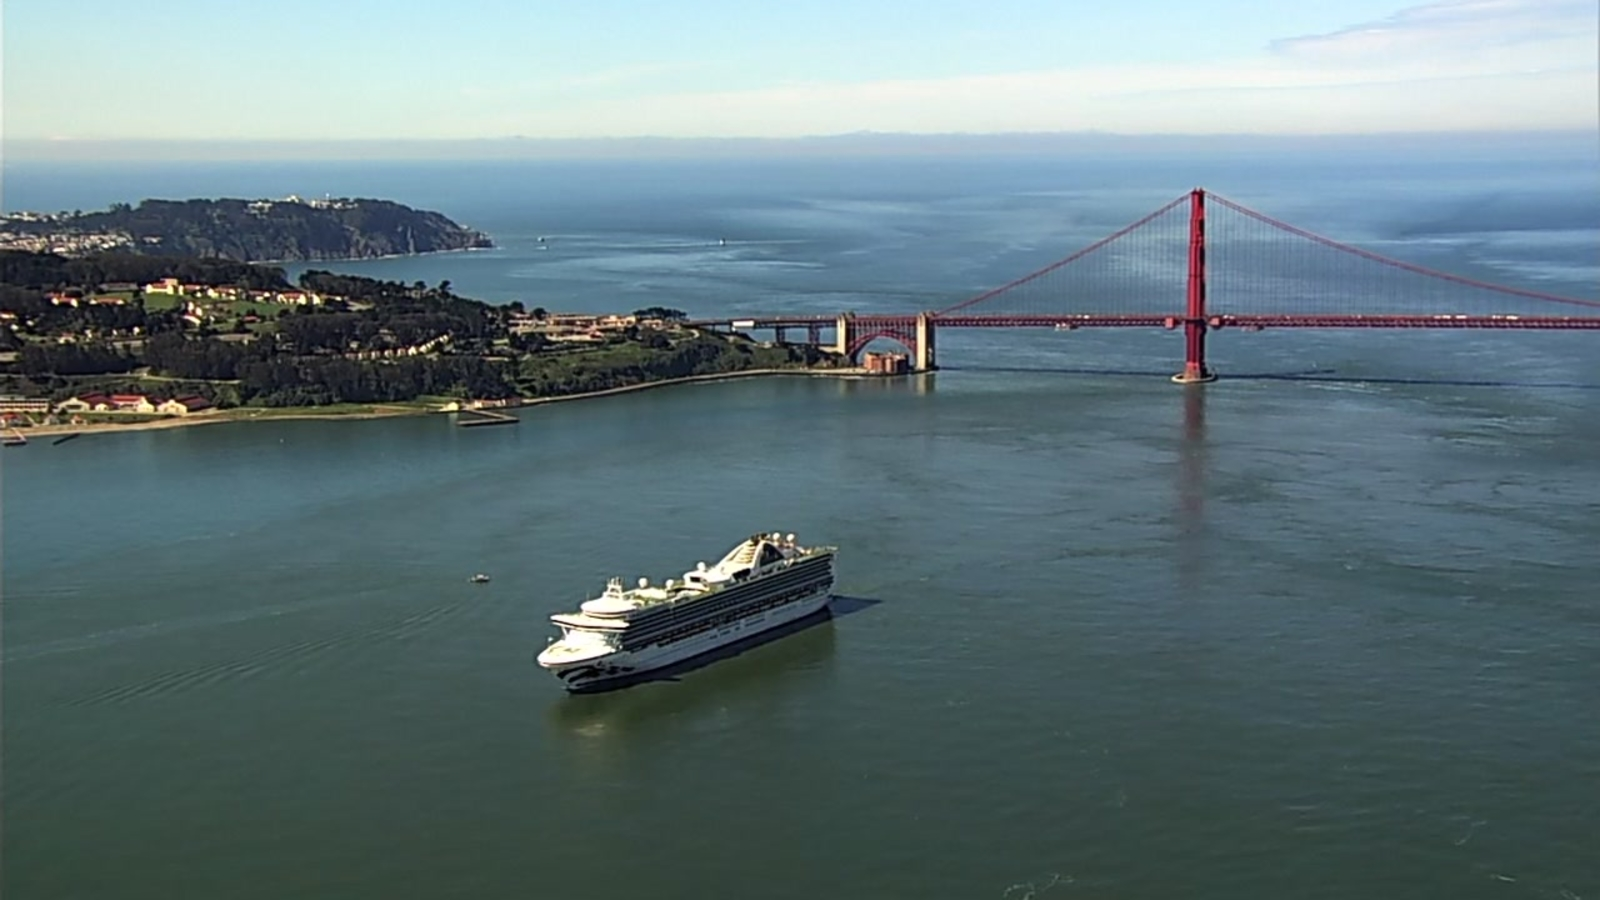 Coronavirus: Grand Princess returns to San Francisco to restock supplies, activists worried about crew members